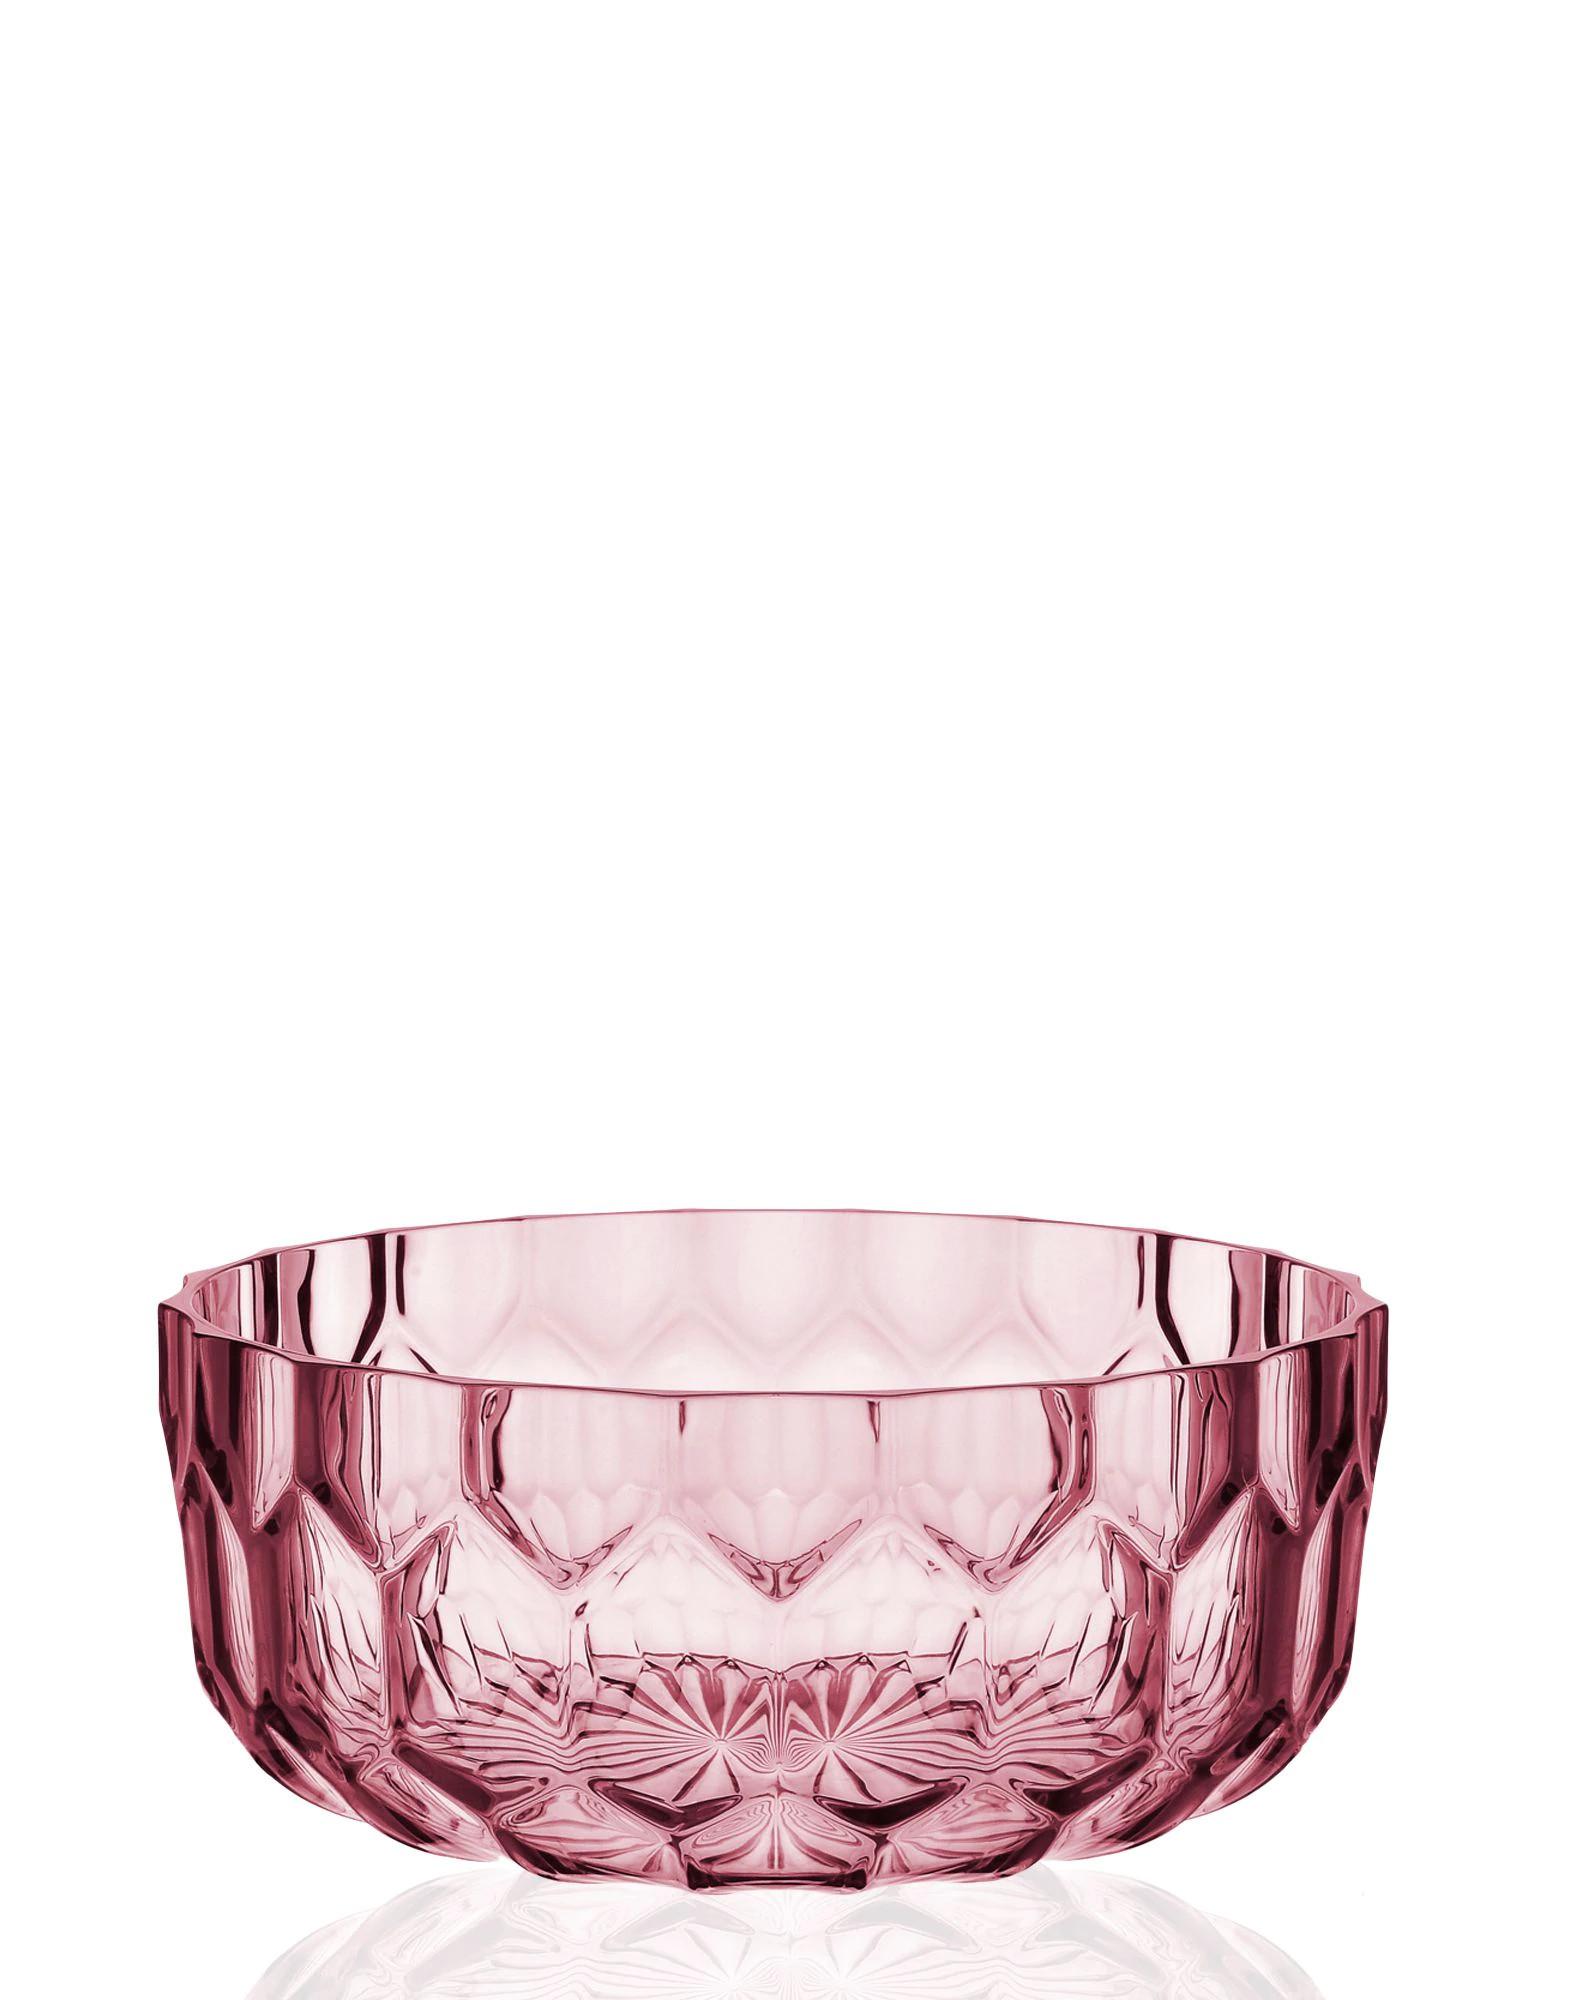 Kartell Jellies Family Salad Bowl Pink 2